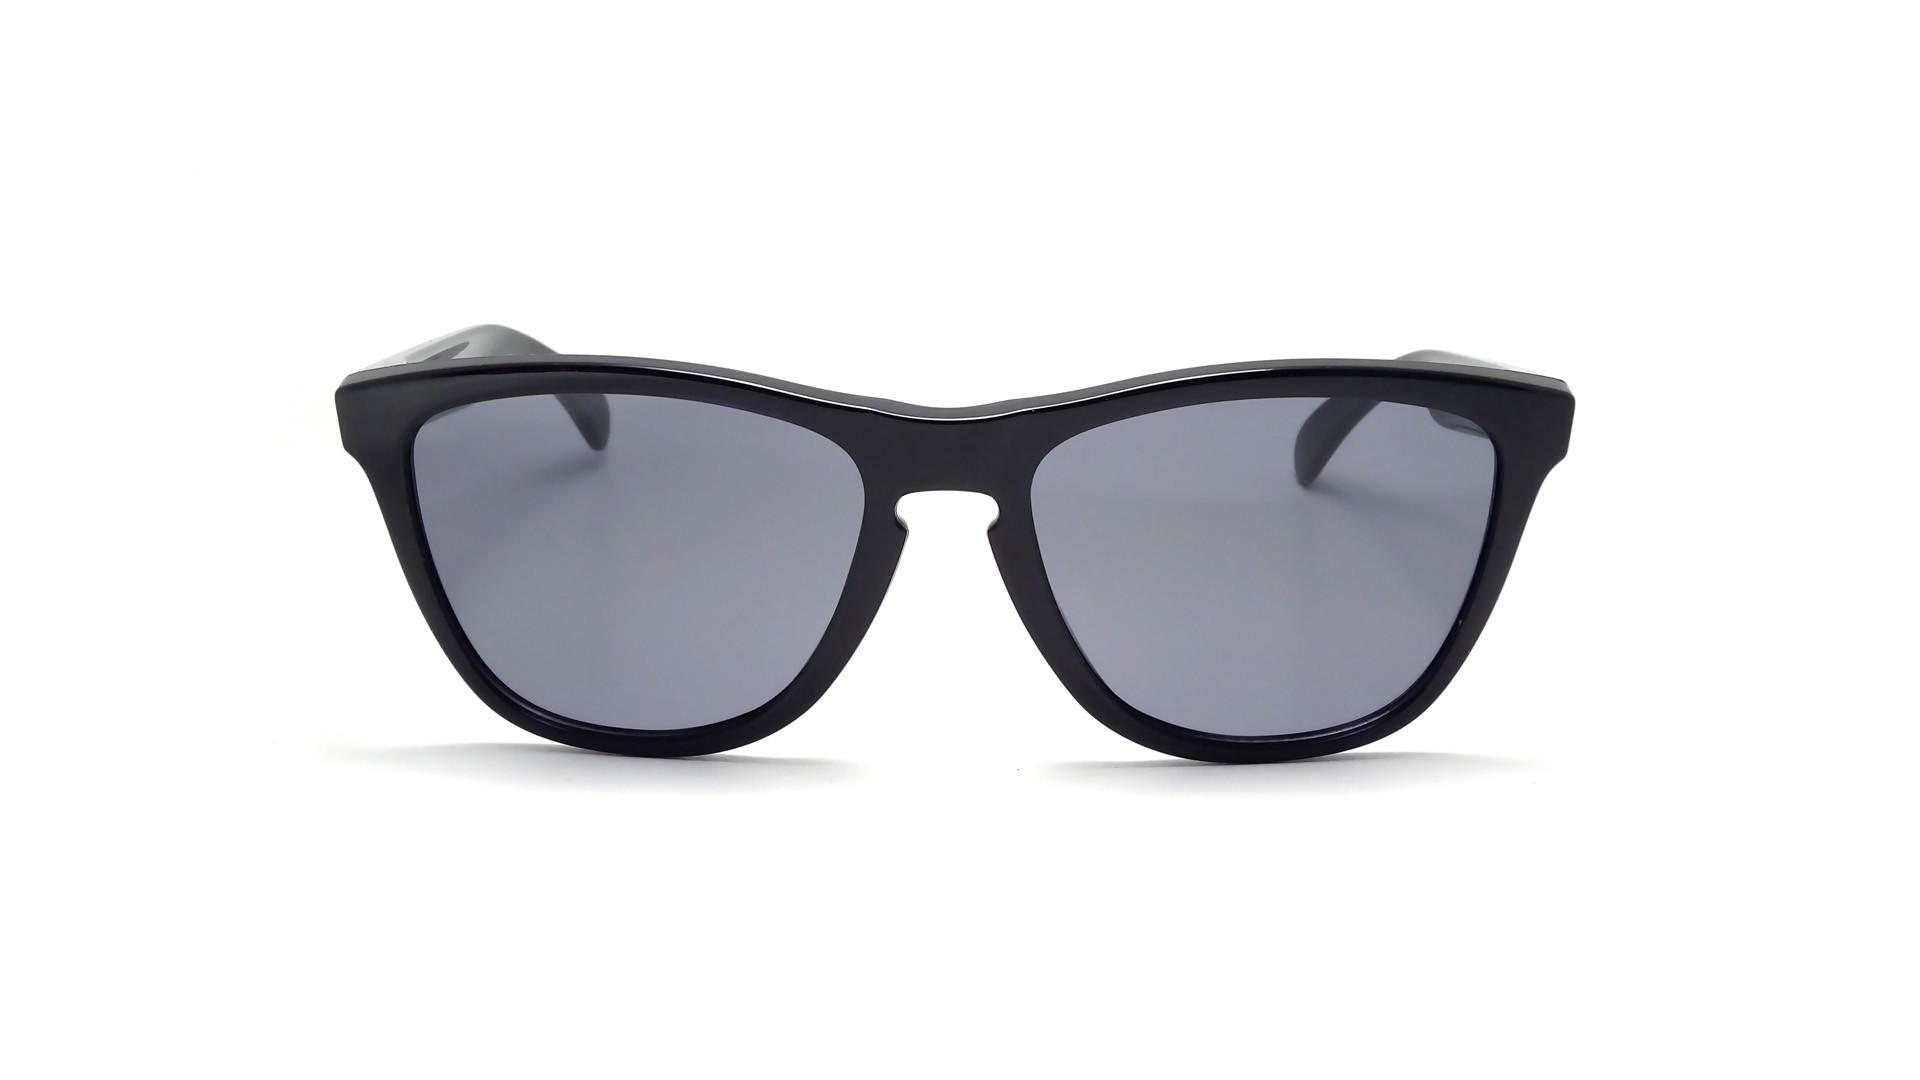 5dd9c8a5d1088 Sunglasses Oakley Frogskins Black OO9013 24-306 55-17 Medium